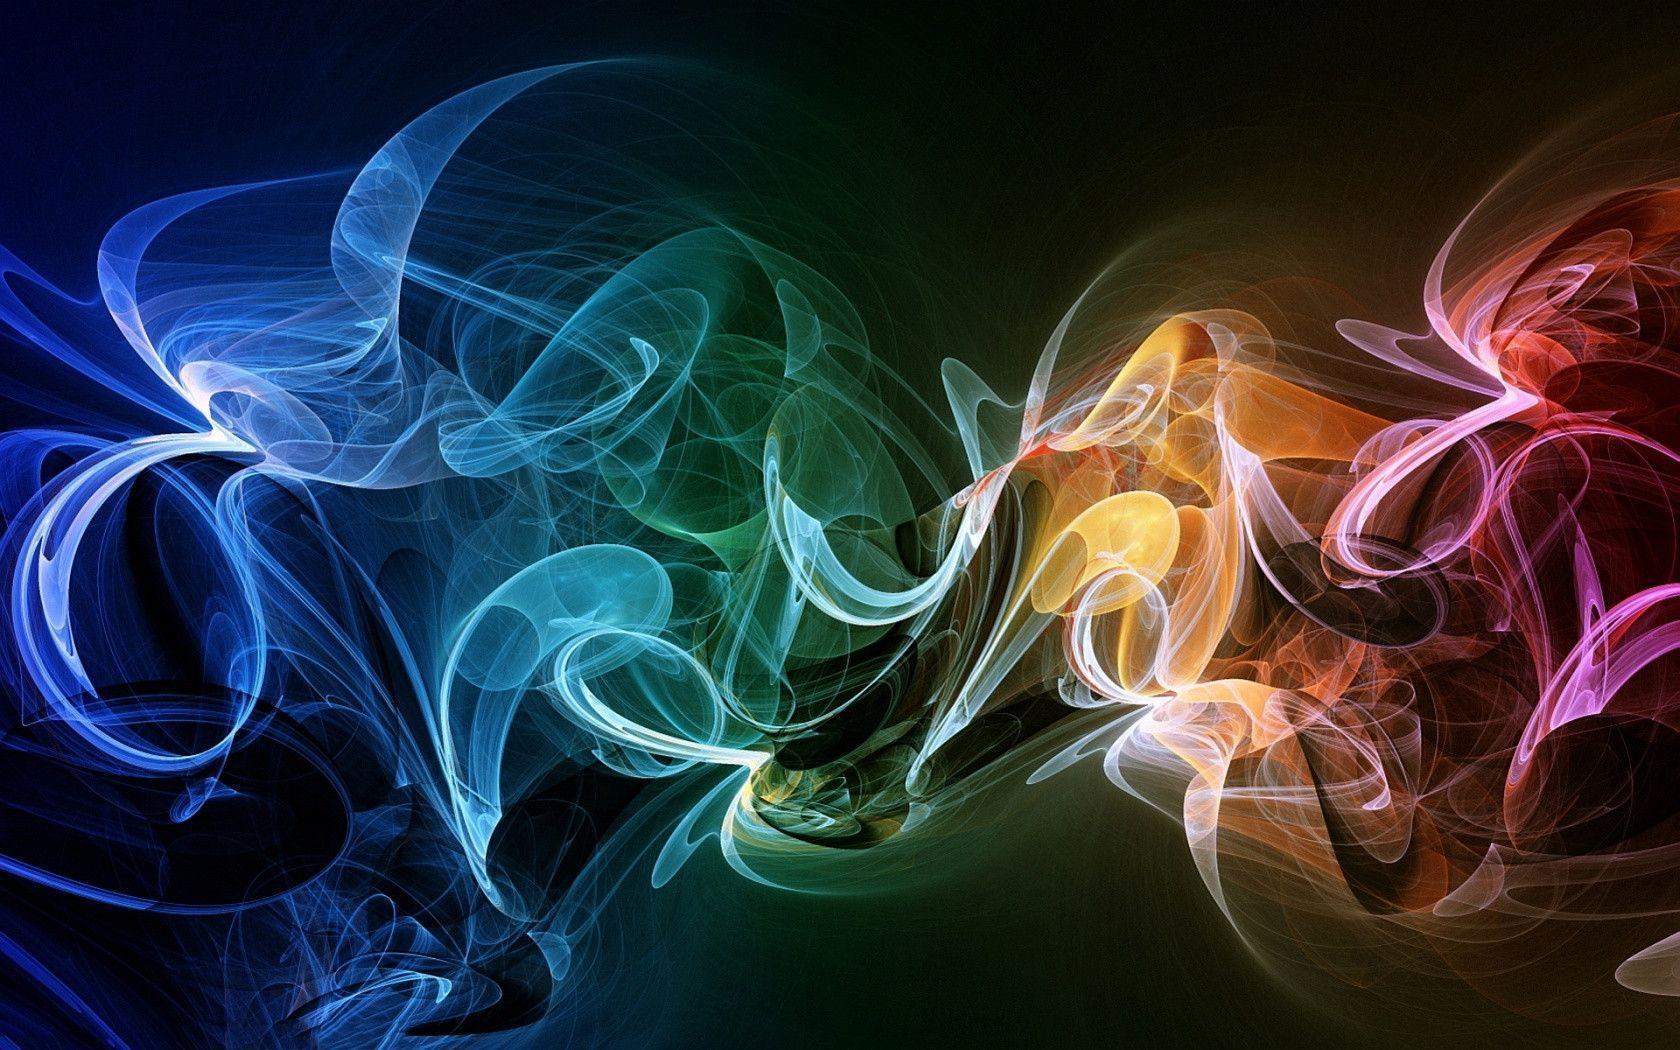 weed smoke art wallpaper - photo #9